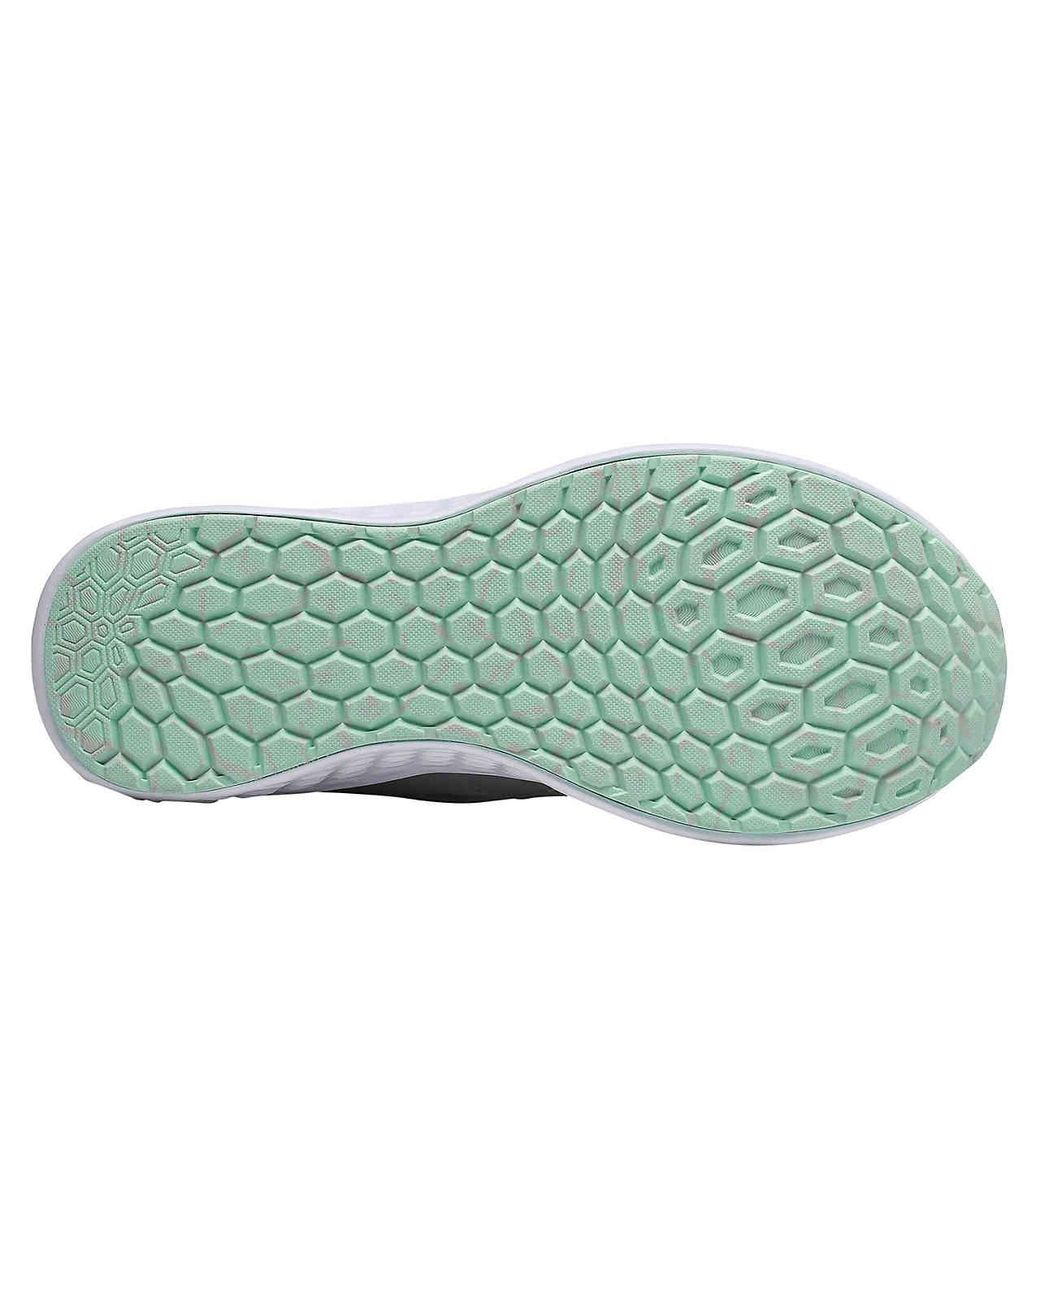 b6f011773 New Balance Fresh Foam Vero Sport Running Shoe in Gray - Lyst